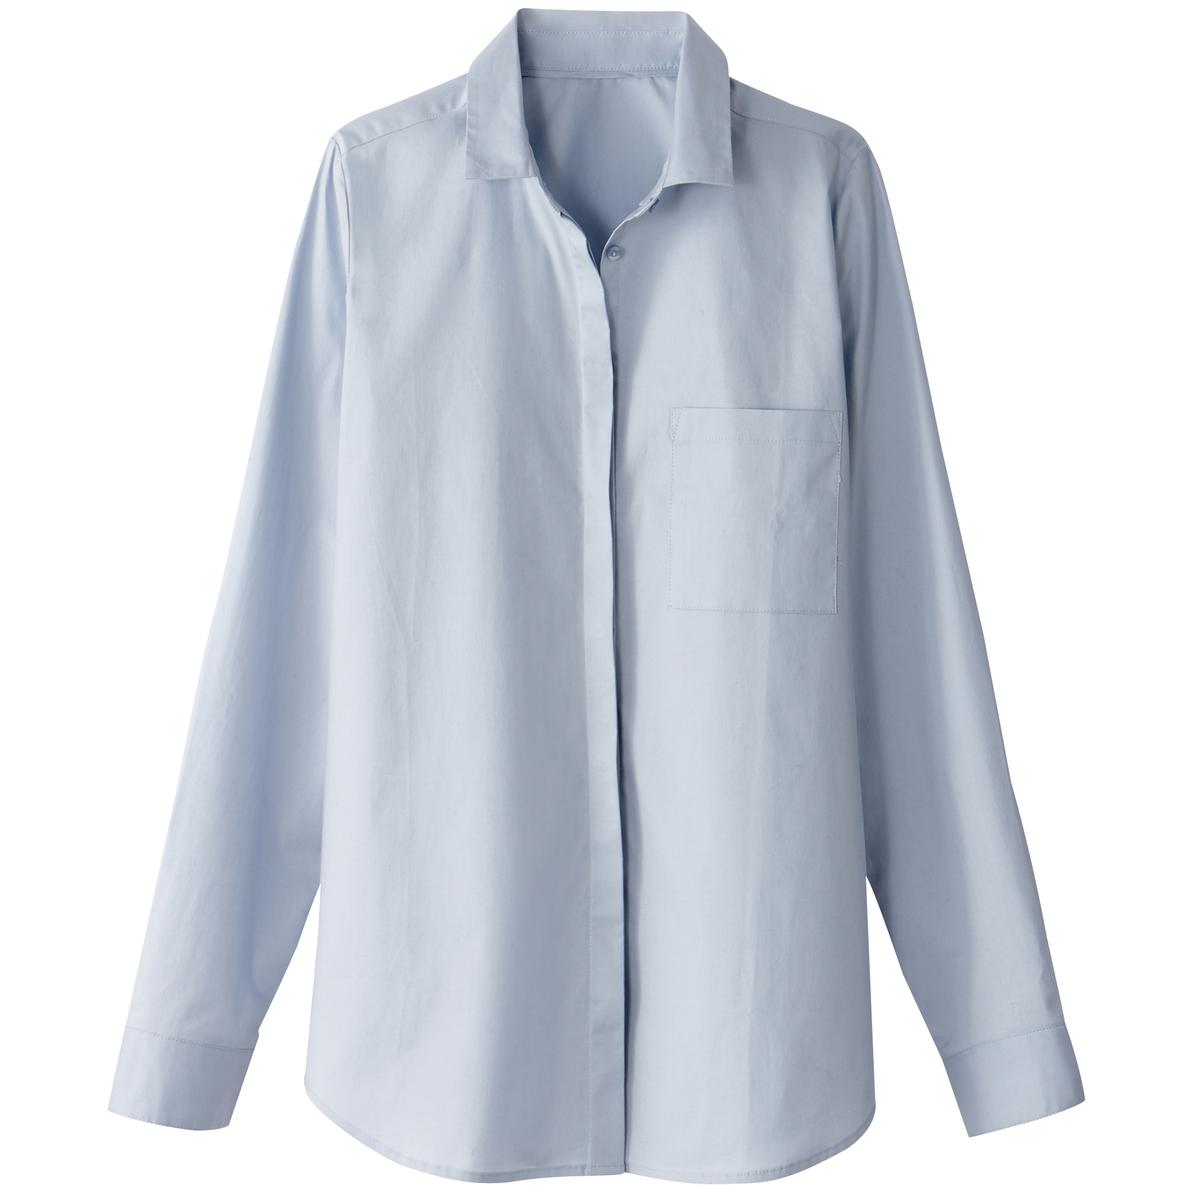 Рубашка прямого покроя с карманом спереди